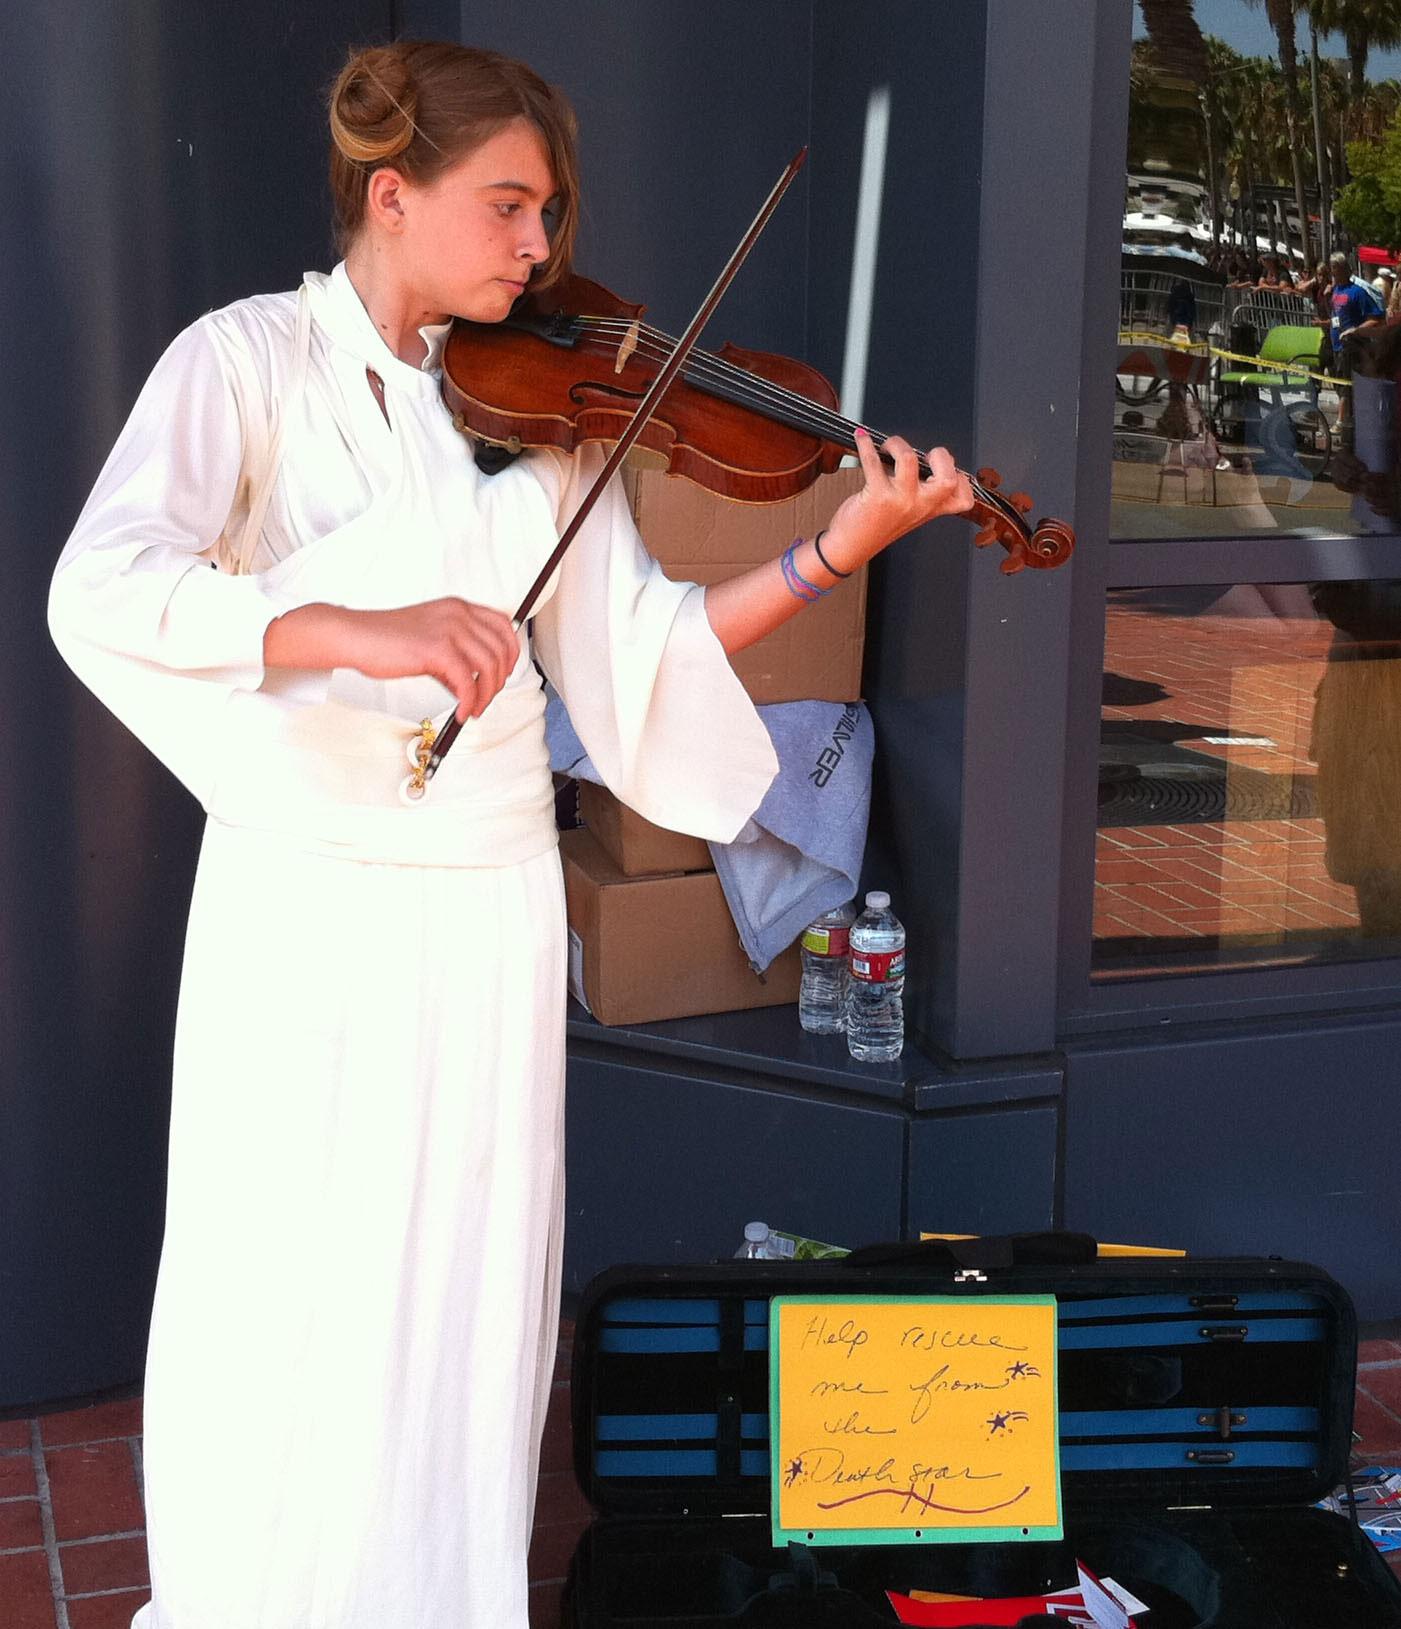 Princess Leah street violinist